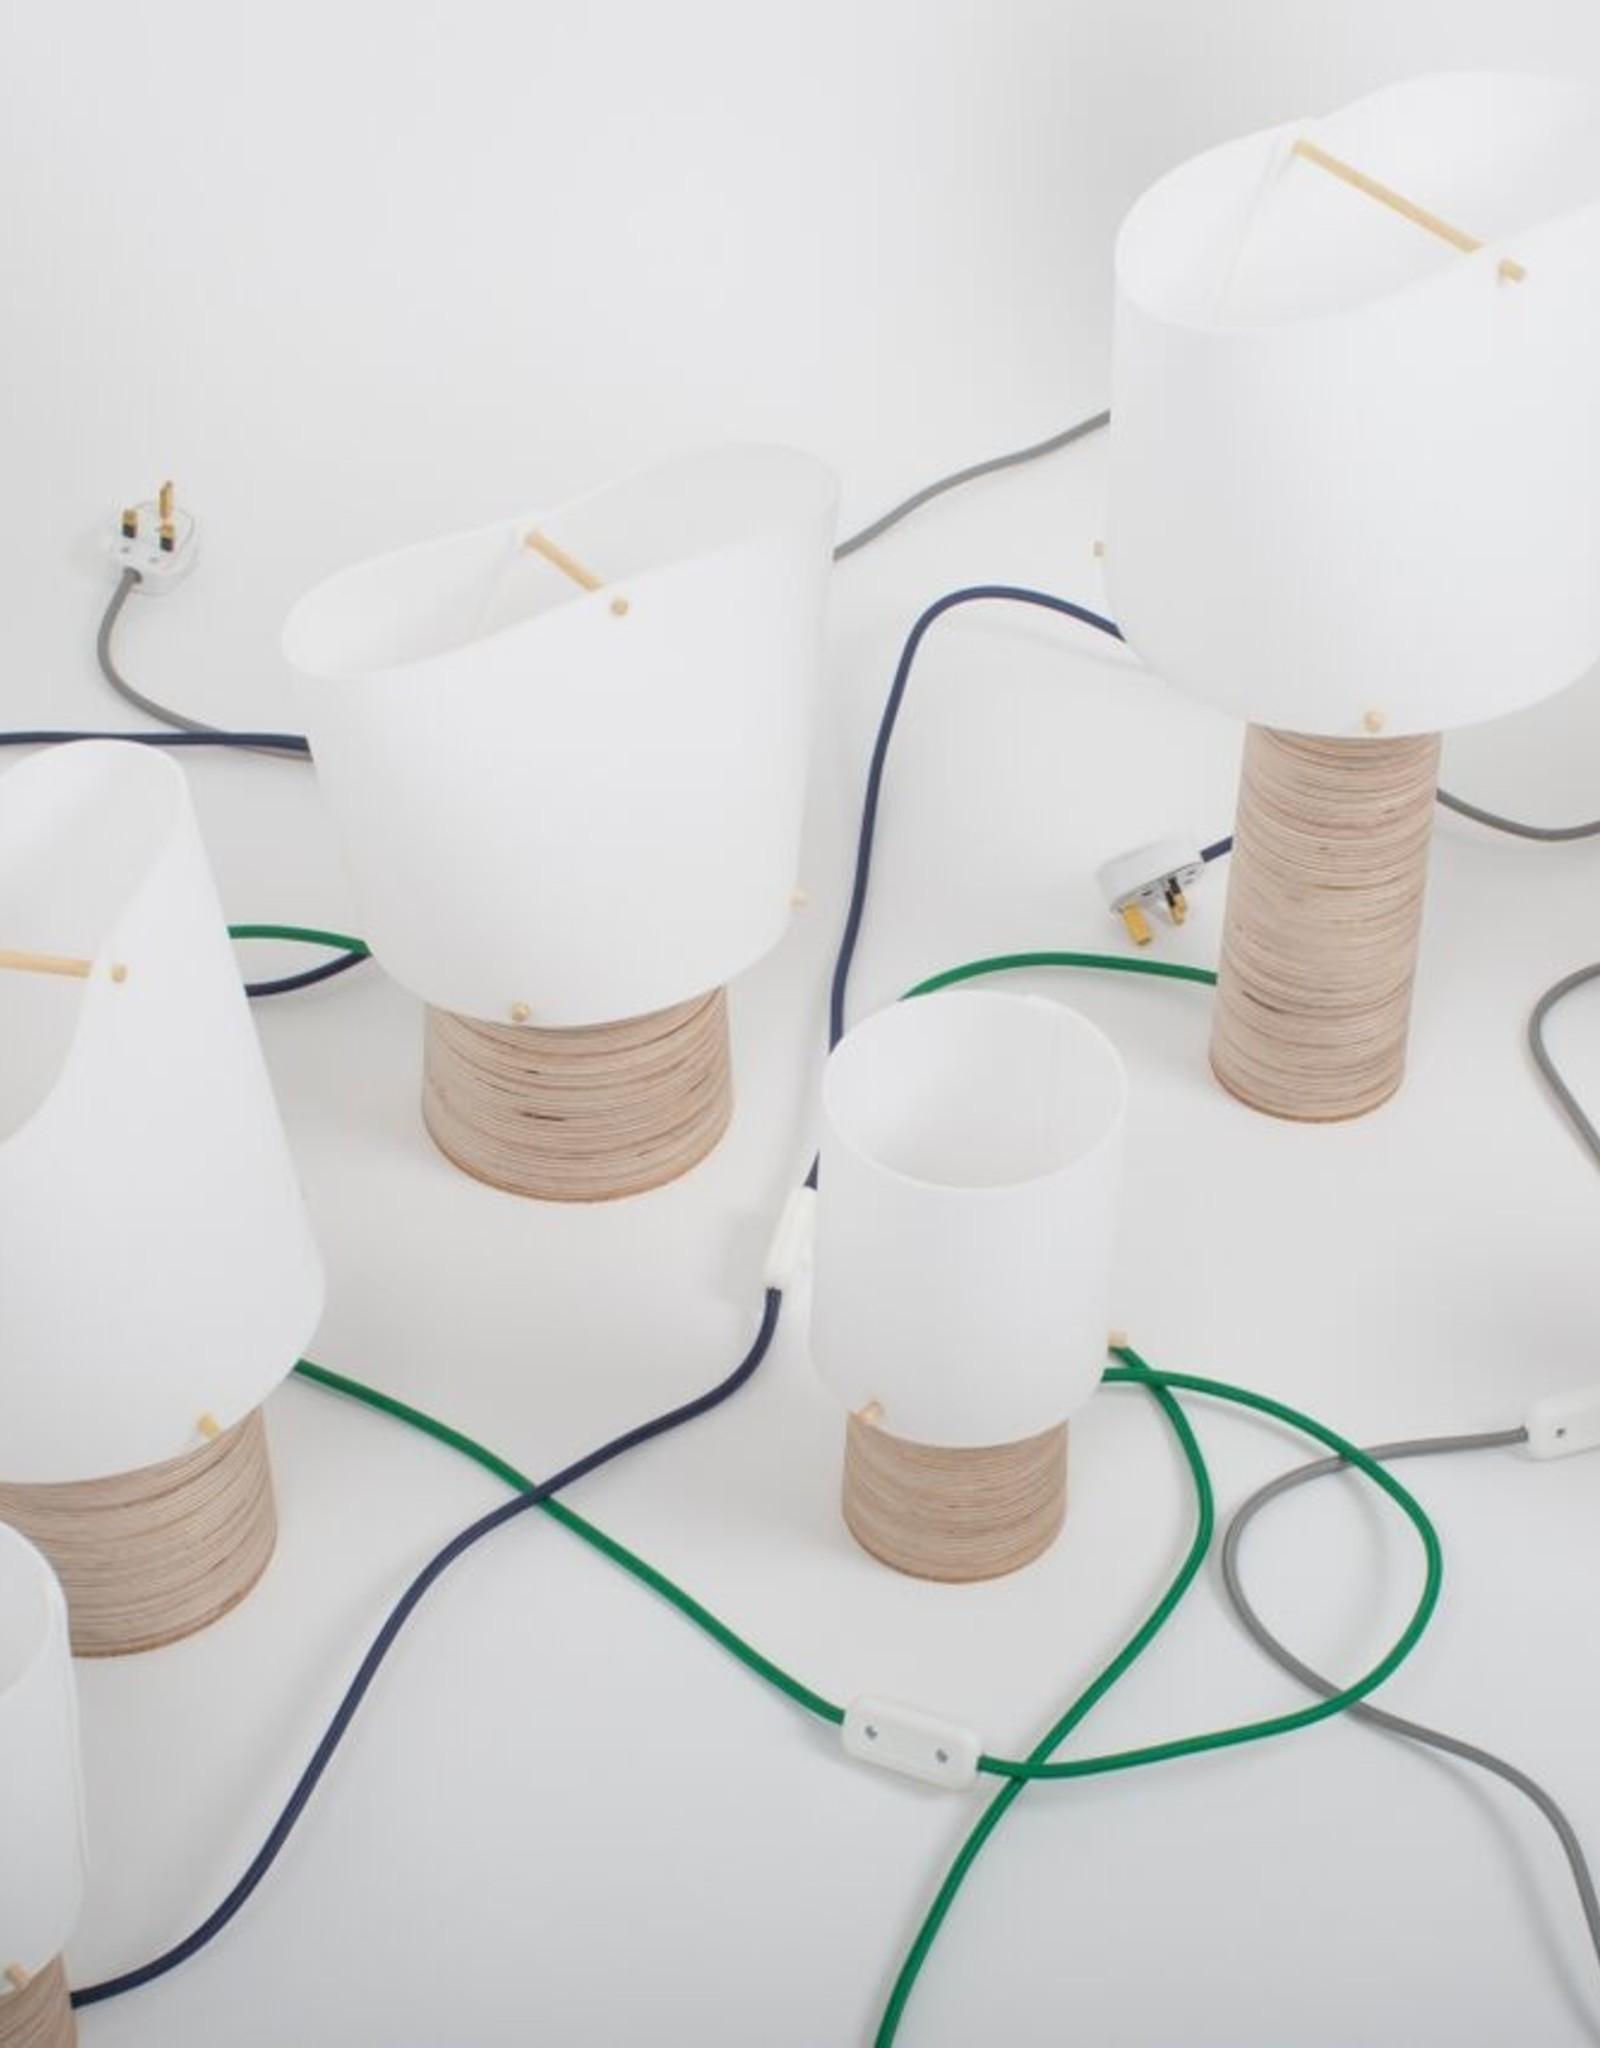 Ned Kaar Small Table Lamp - Hands